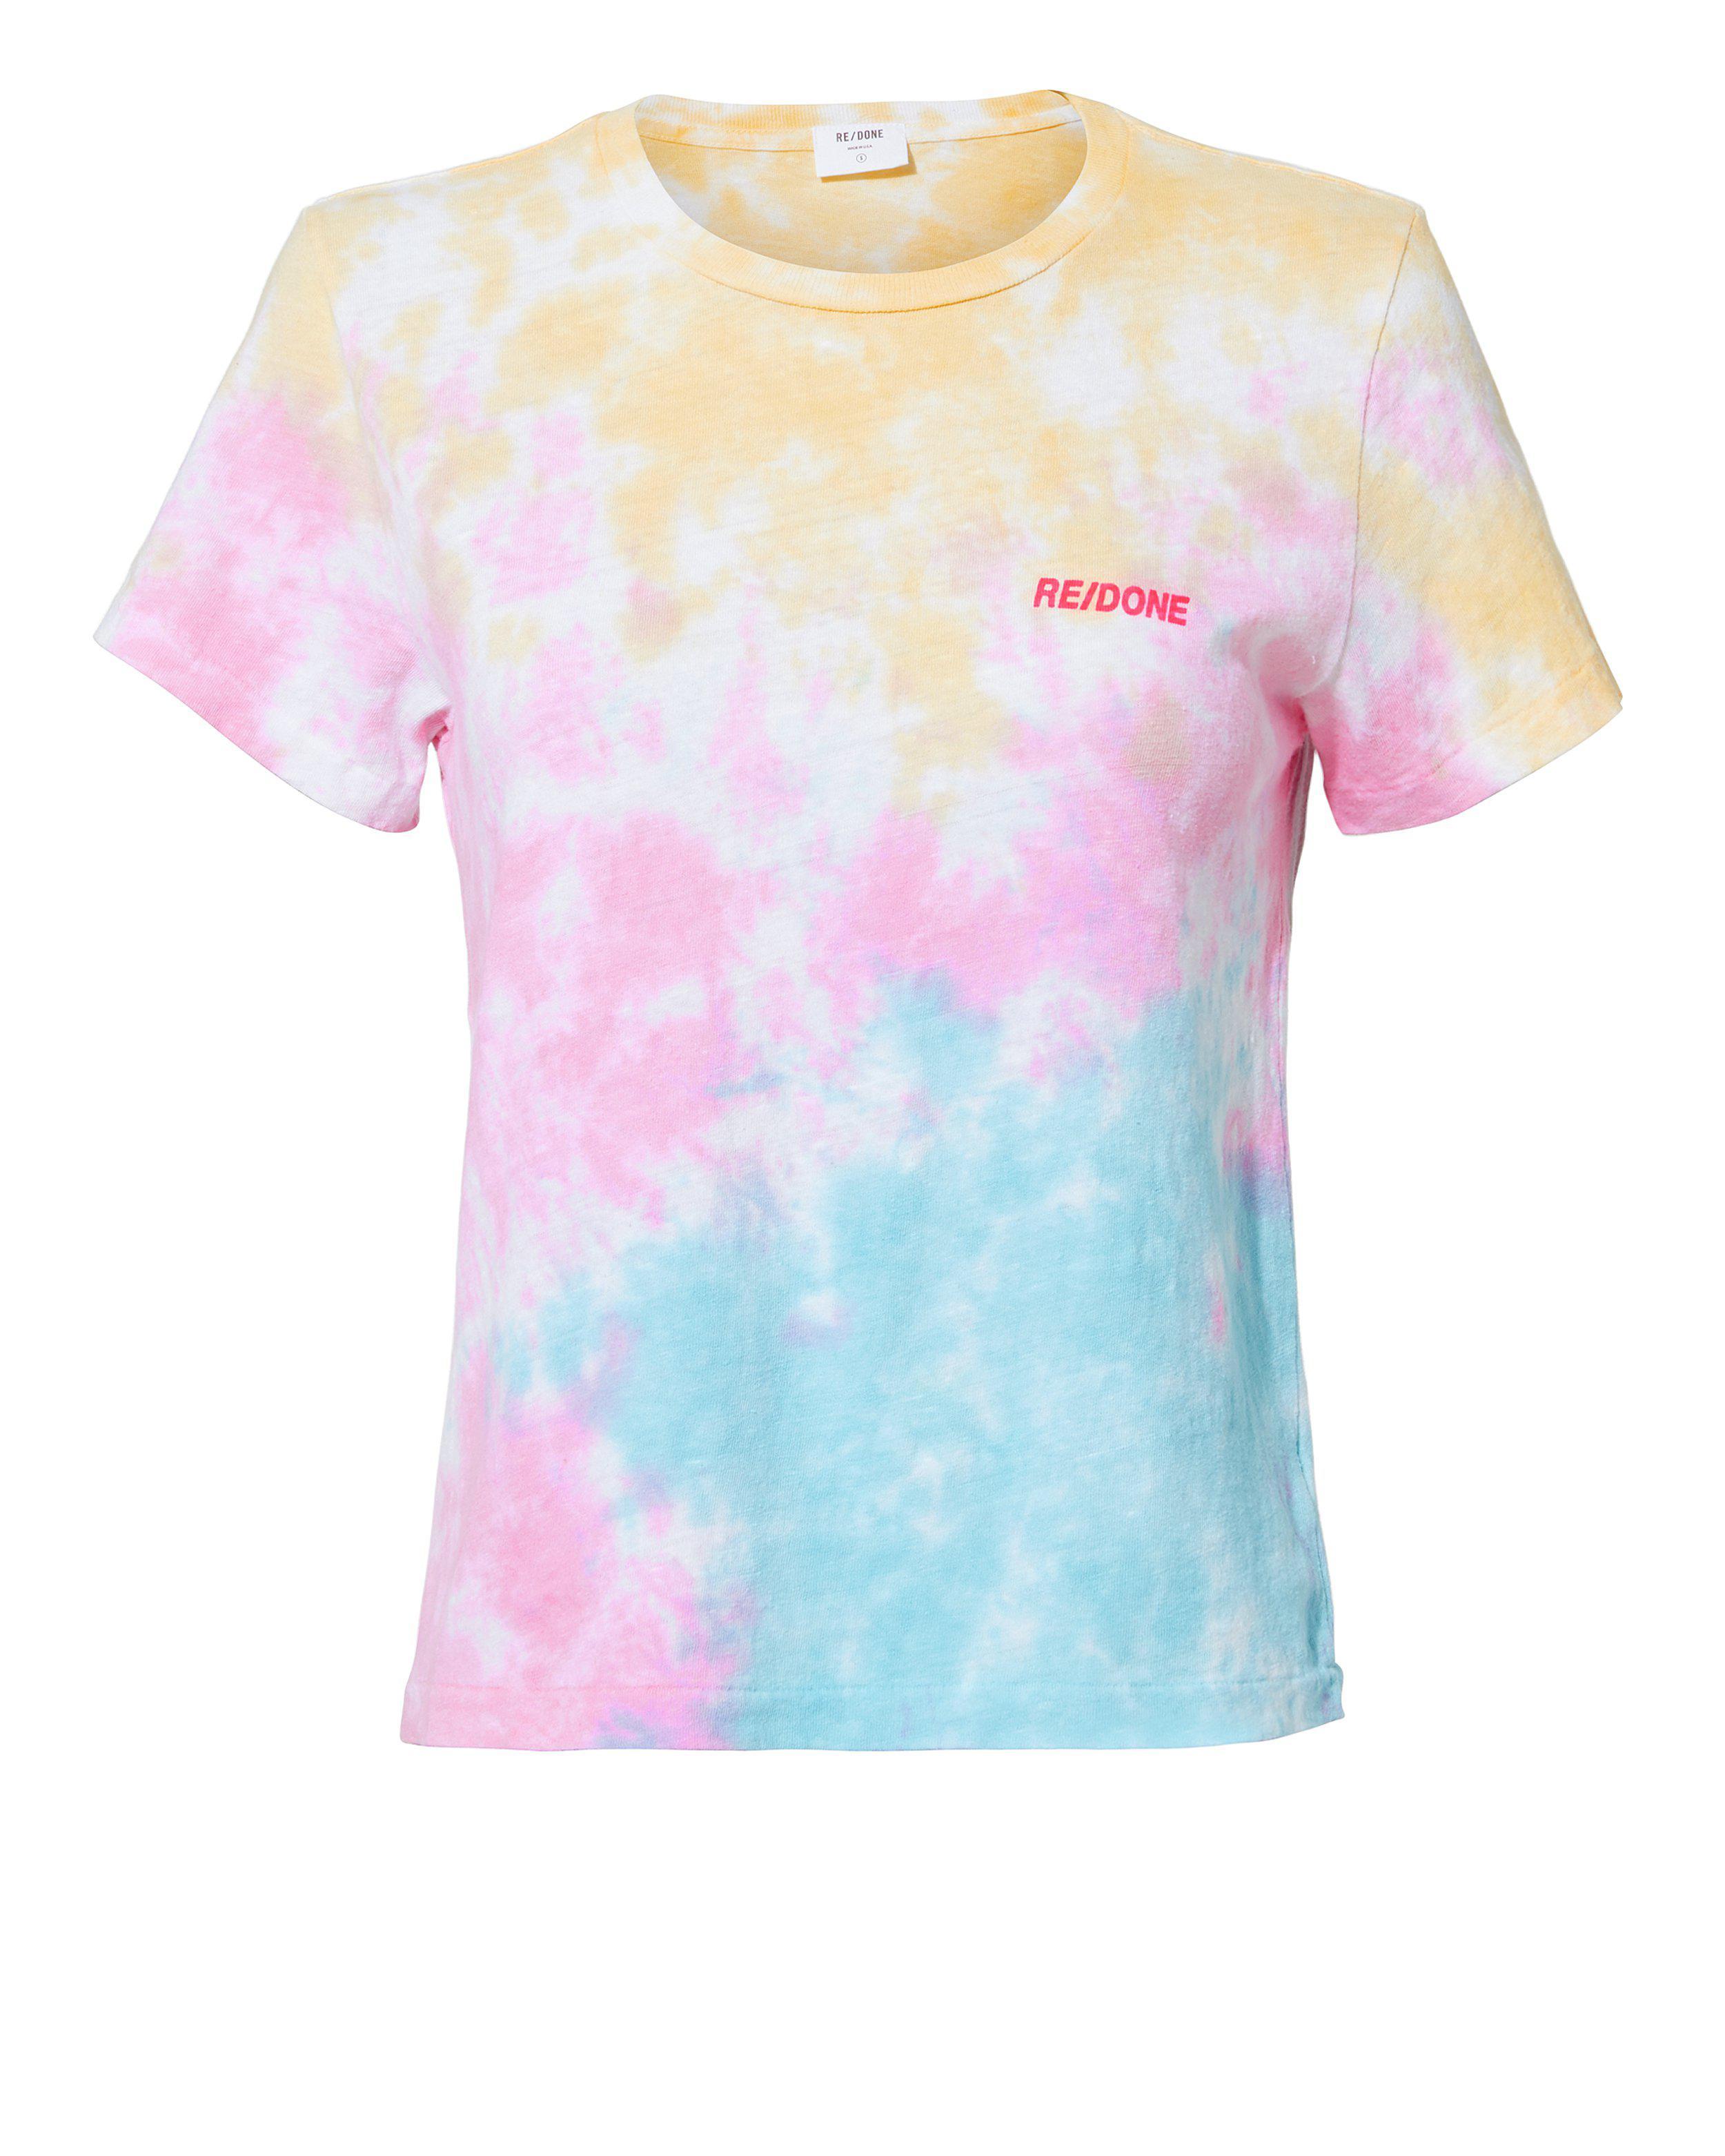 Tie Dye Acid House Spiral 700486 T-shirt